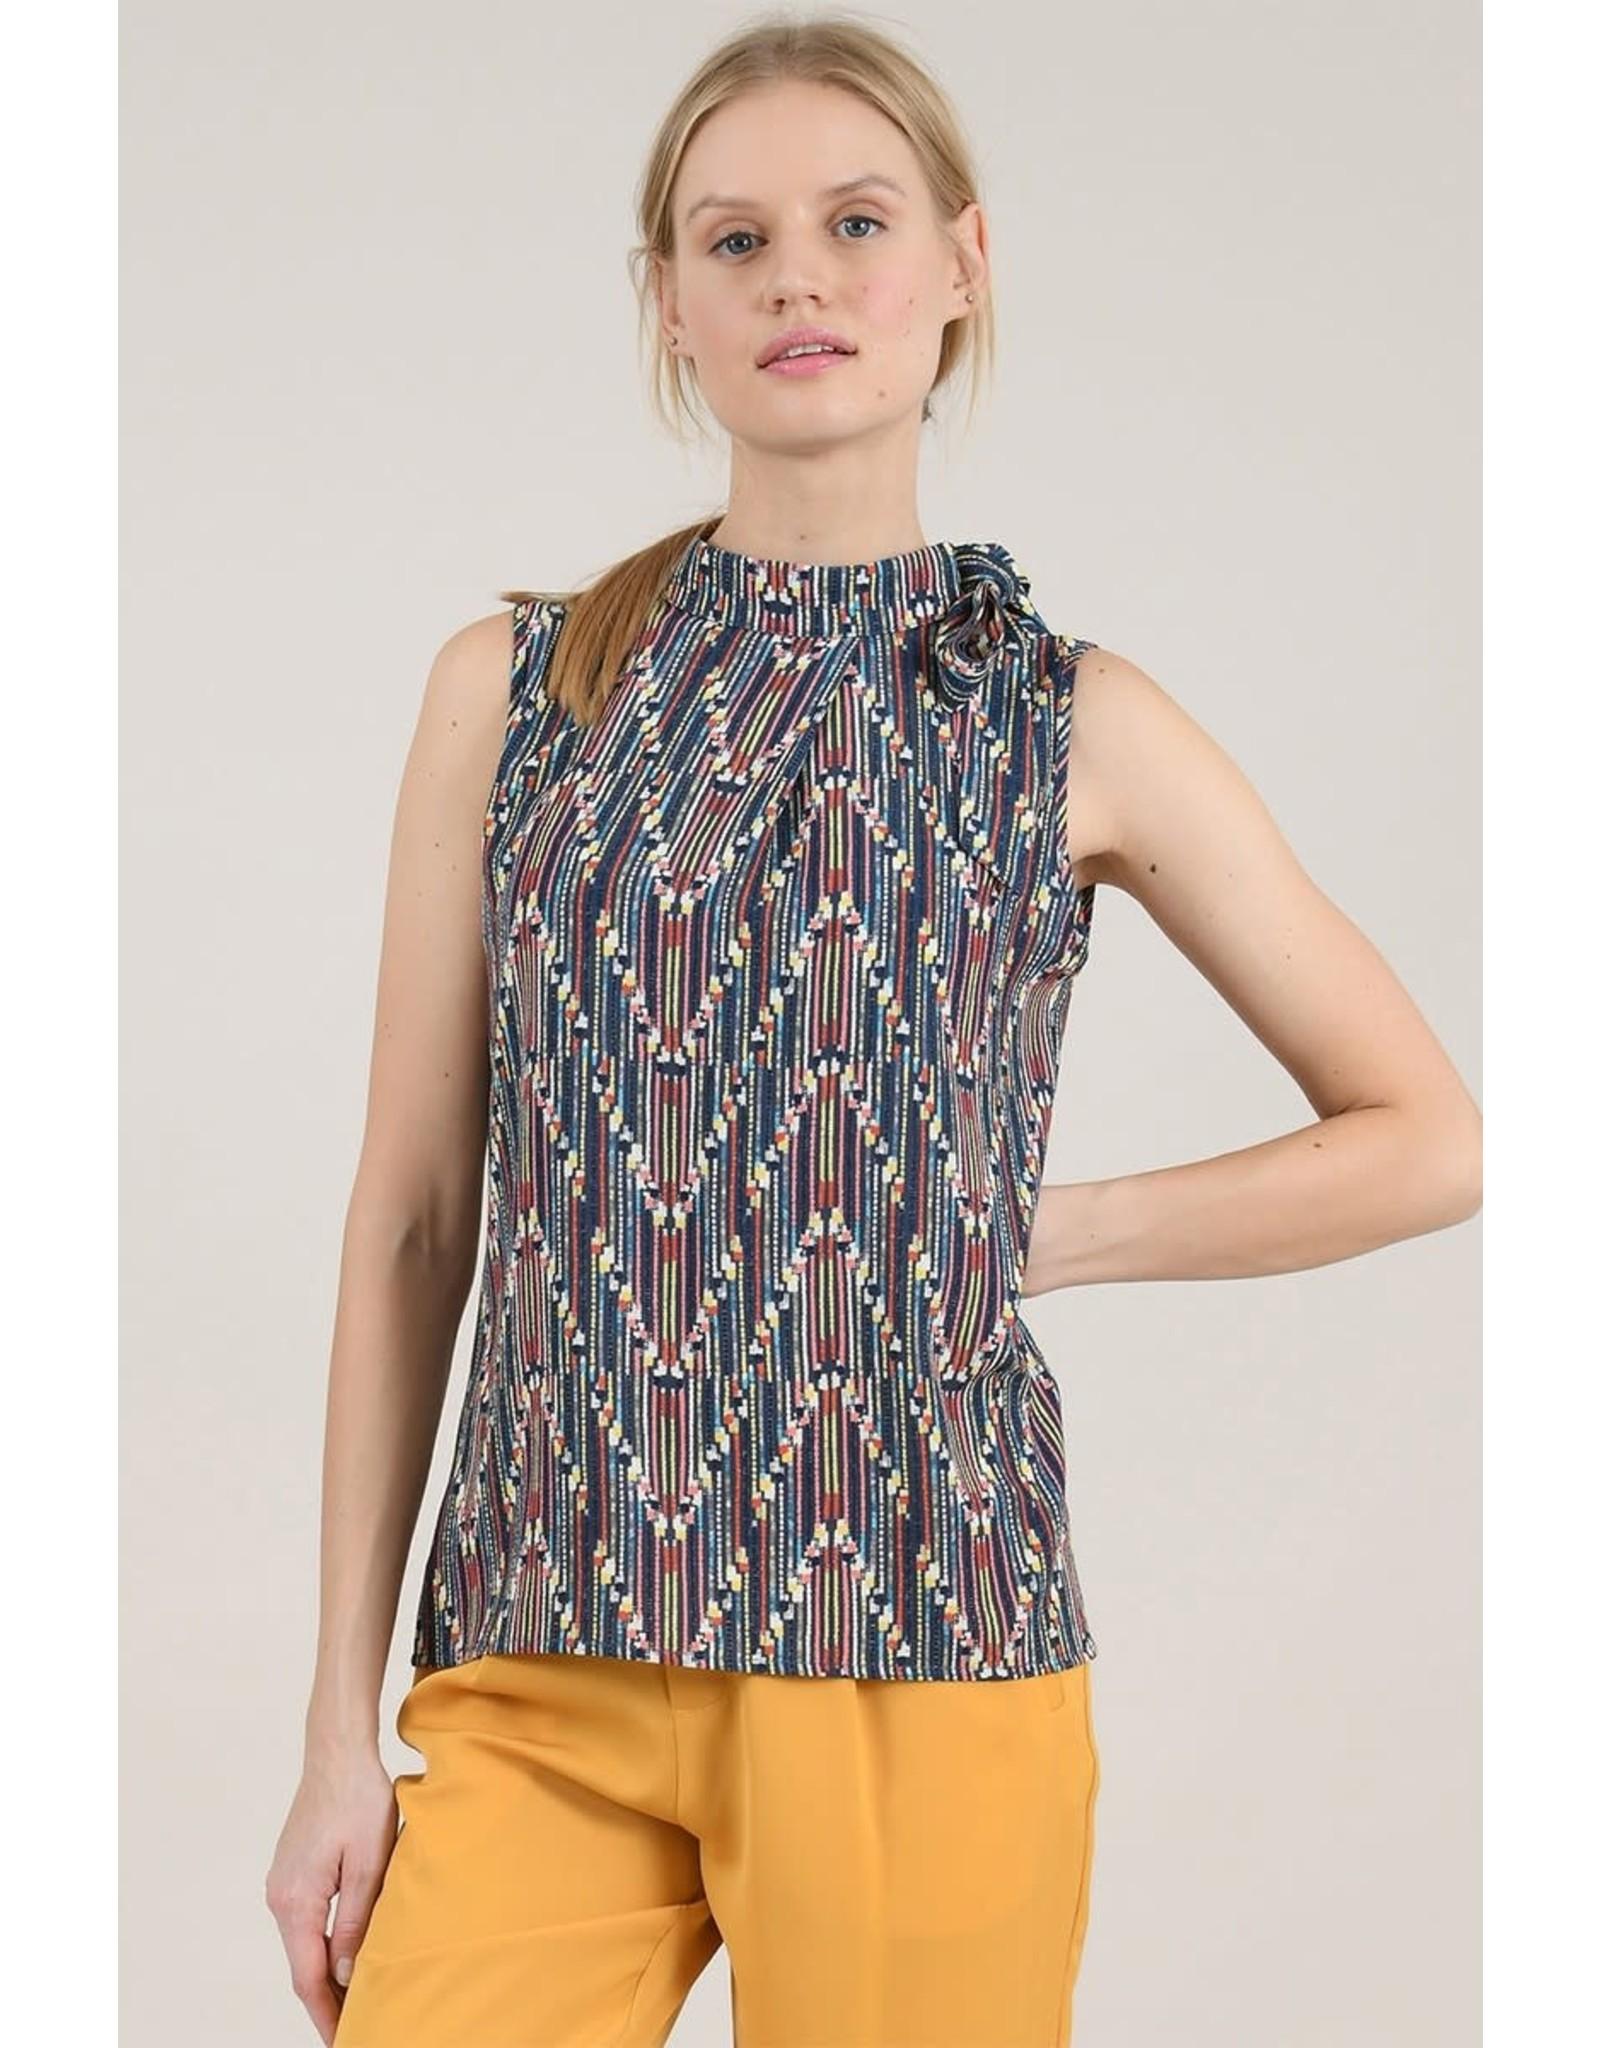 Molly Bracken Sleevless Printed Top